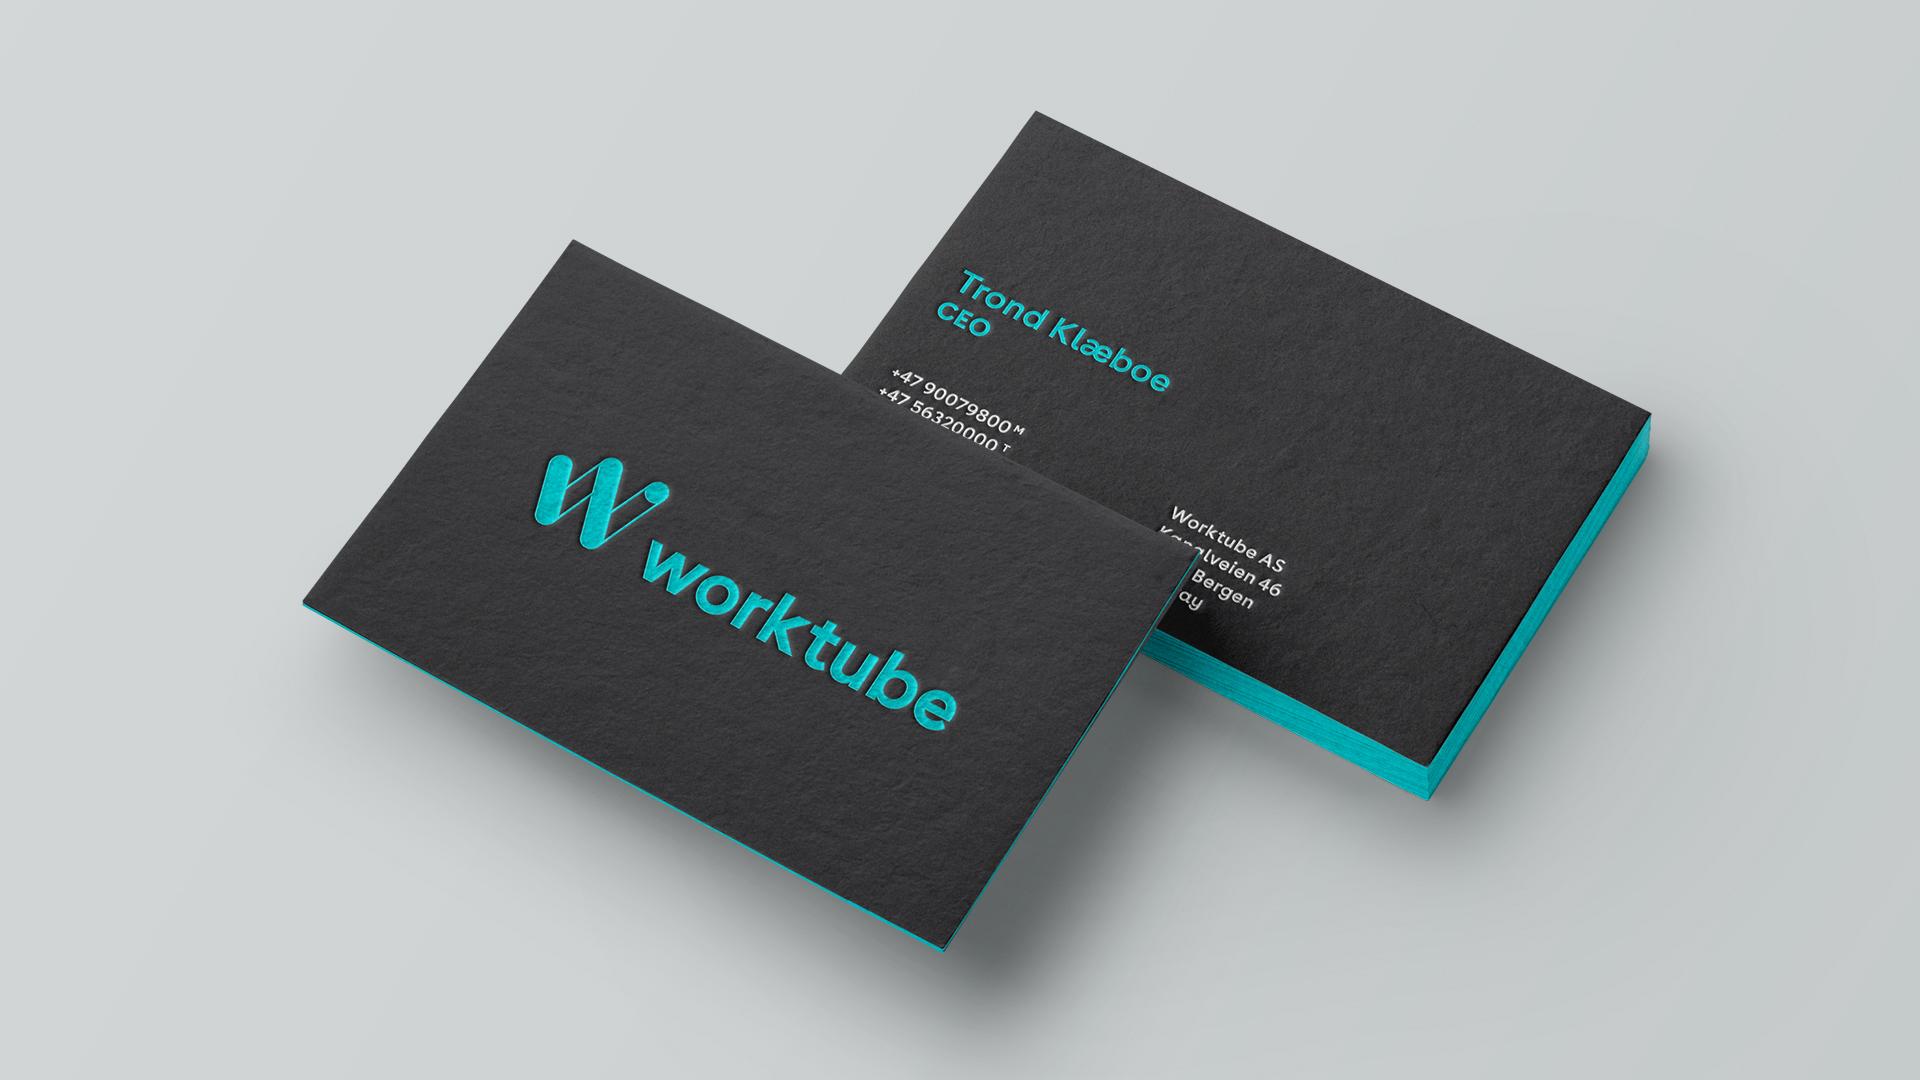 WT_BUSINESS CARDS.jpg